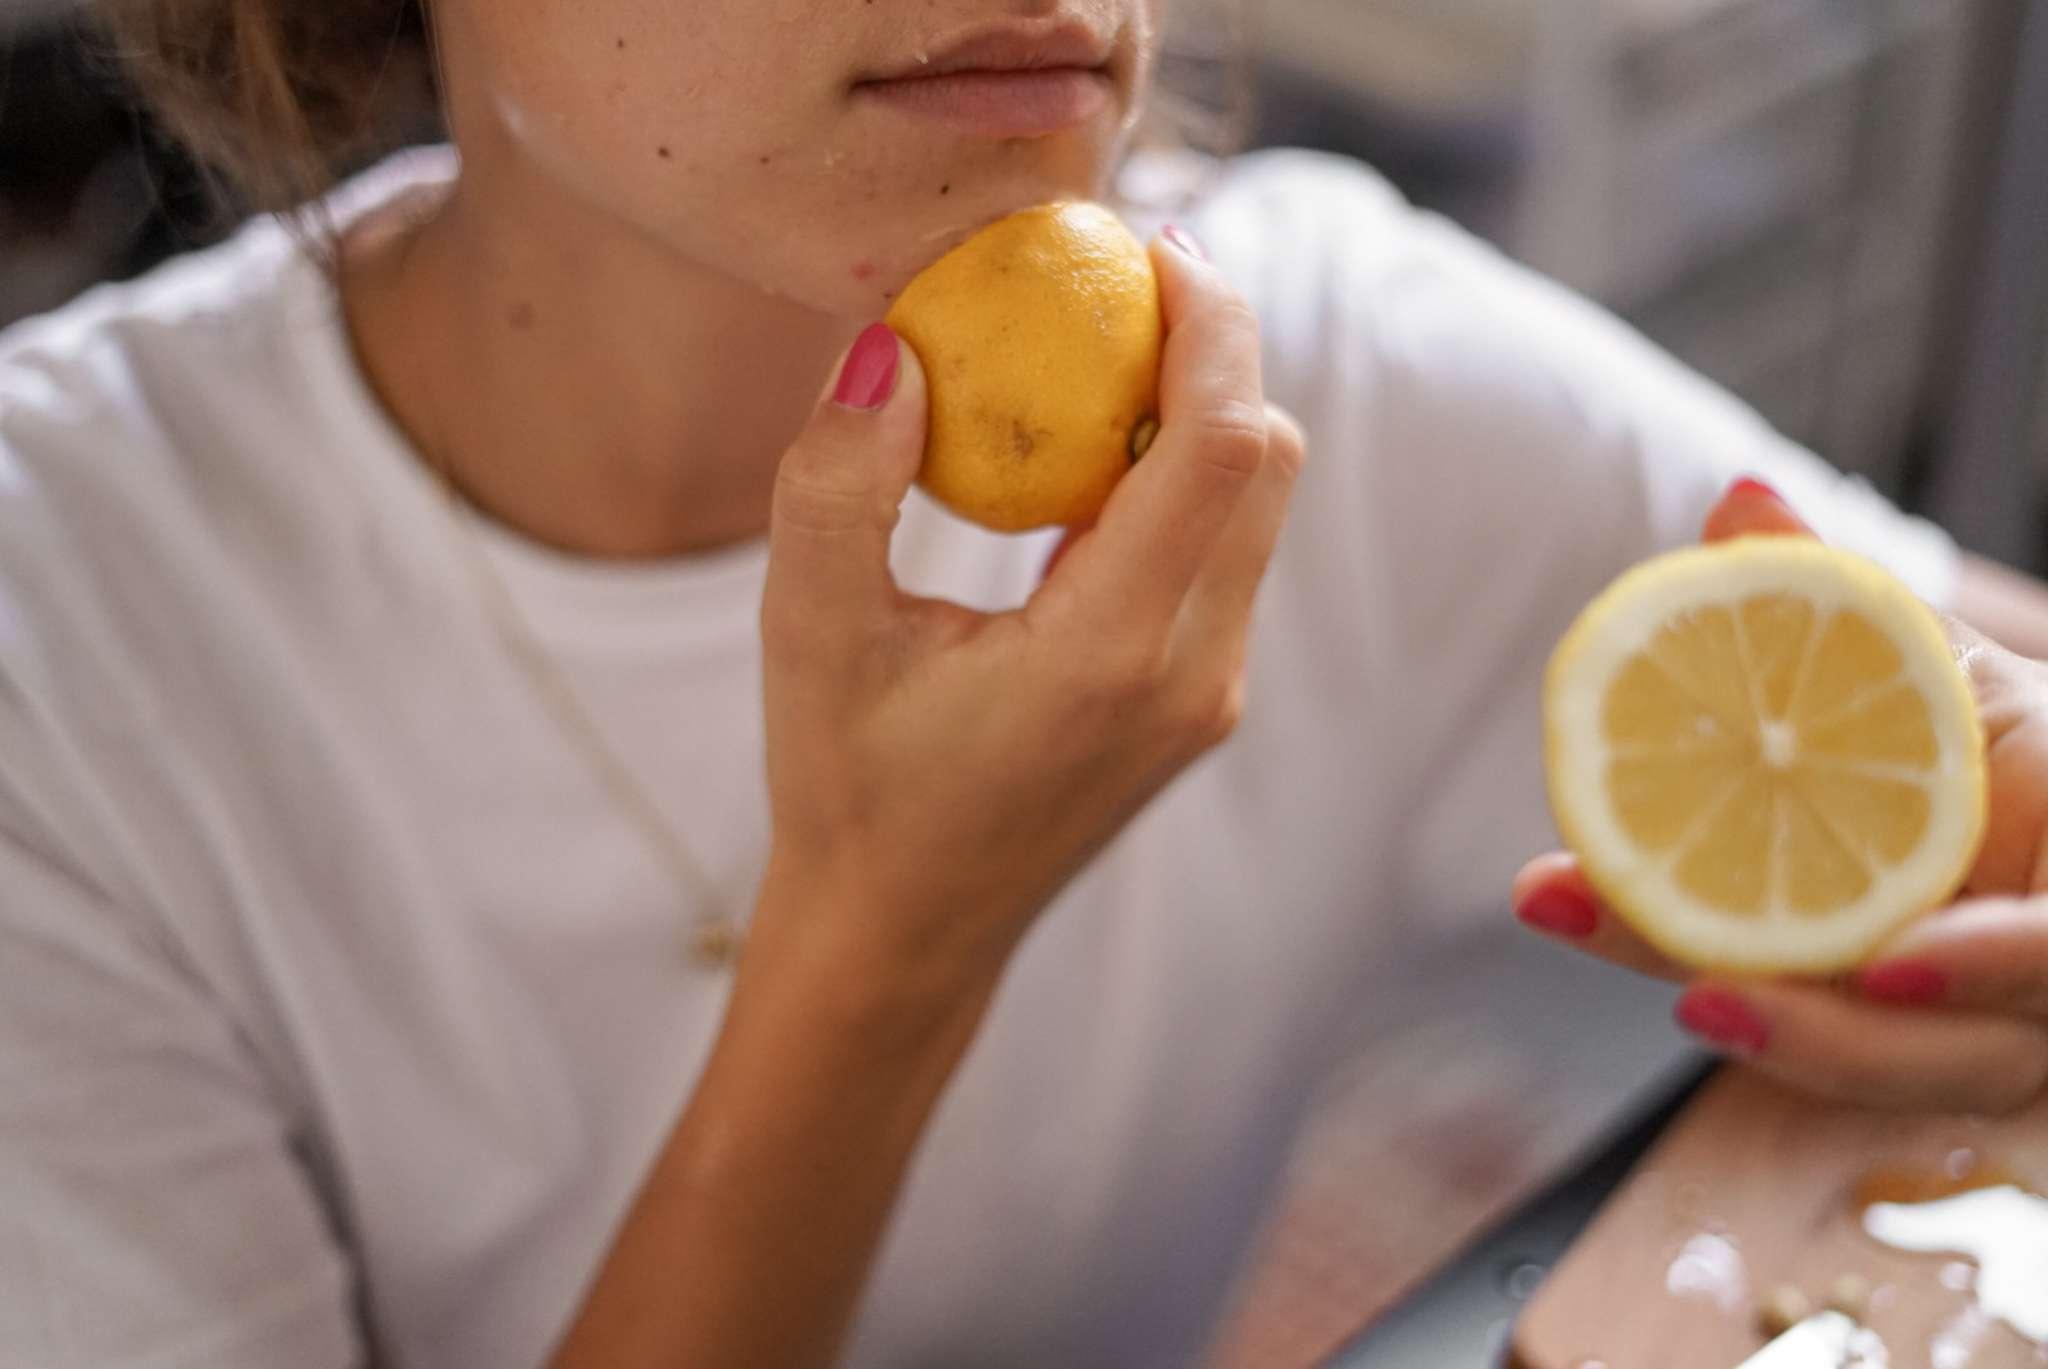 women rubs honey and cut lemon on face as natural beauty treatment